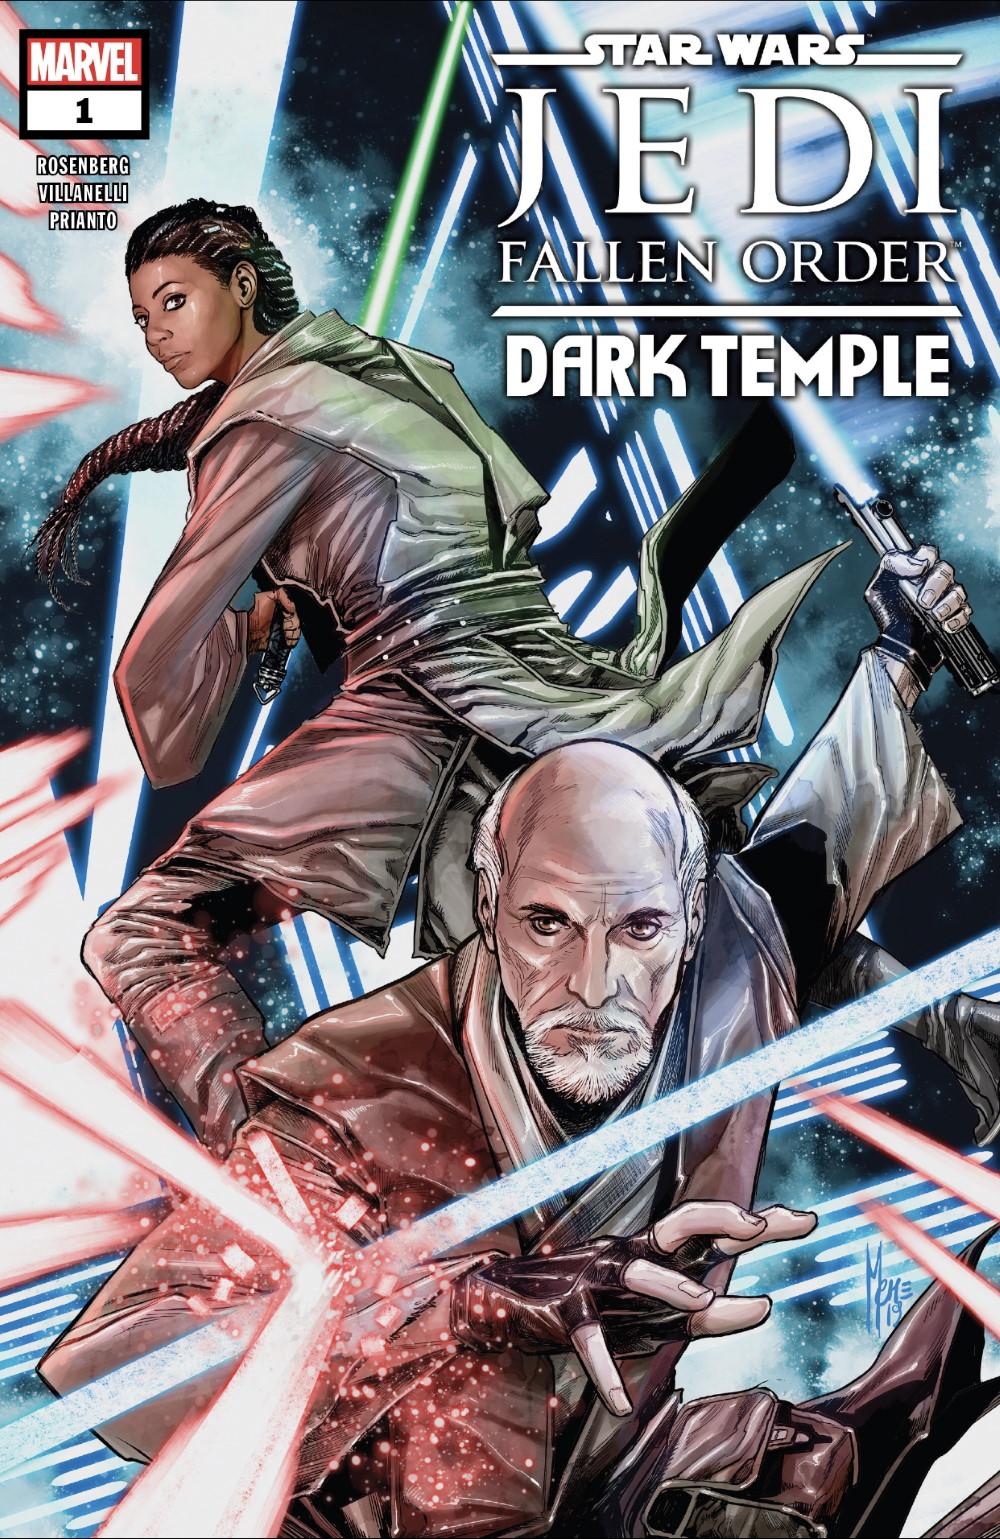 Jedi Fallen Order Dark Temple #1